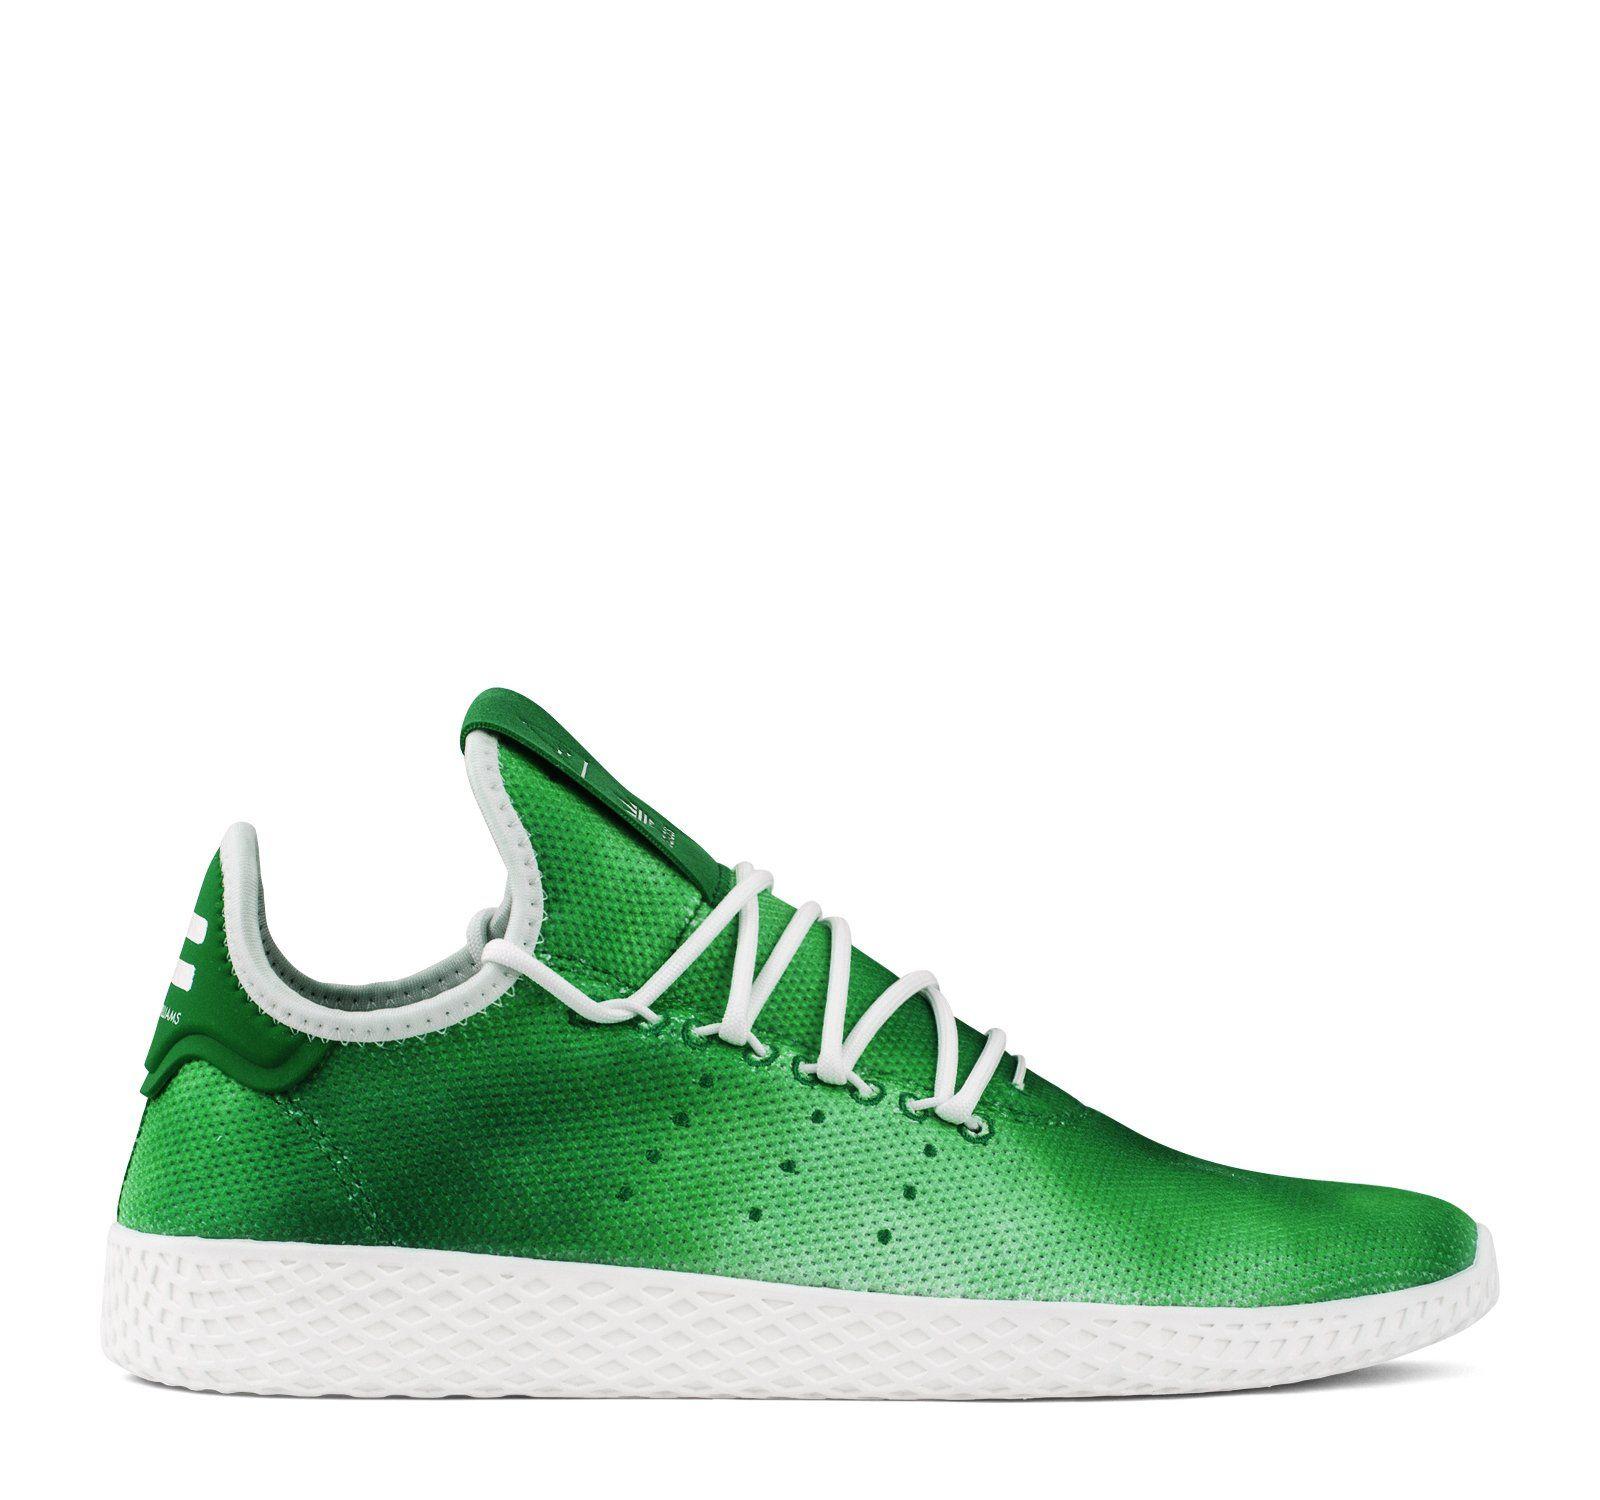 Adidas PW Tennis Hu DA9619 Men's Sneaker in Green | Sneakers